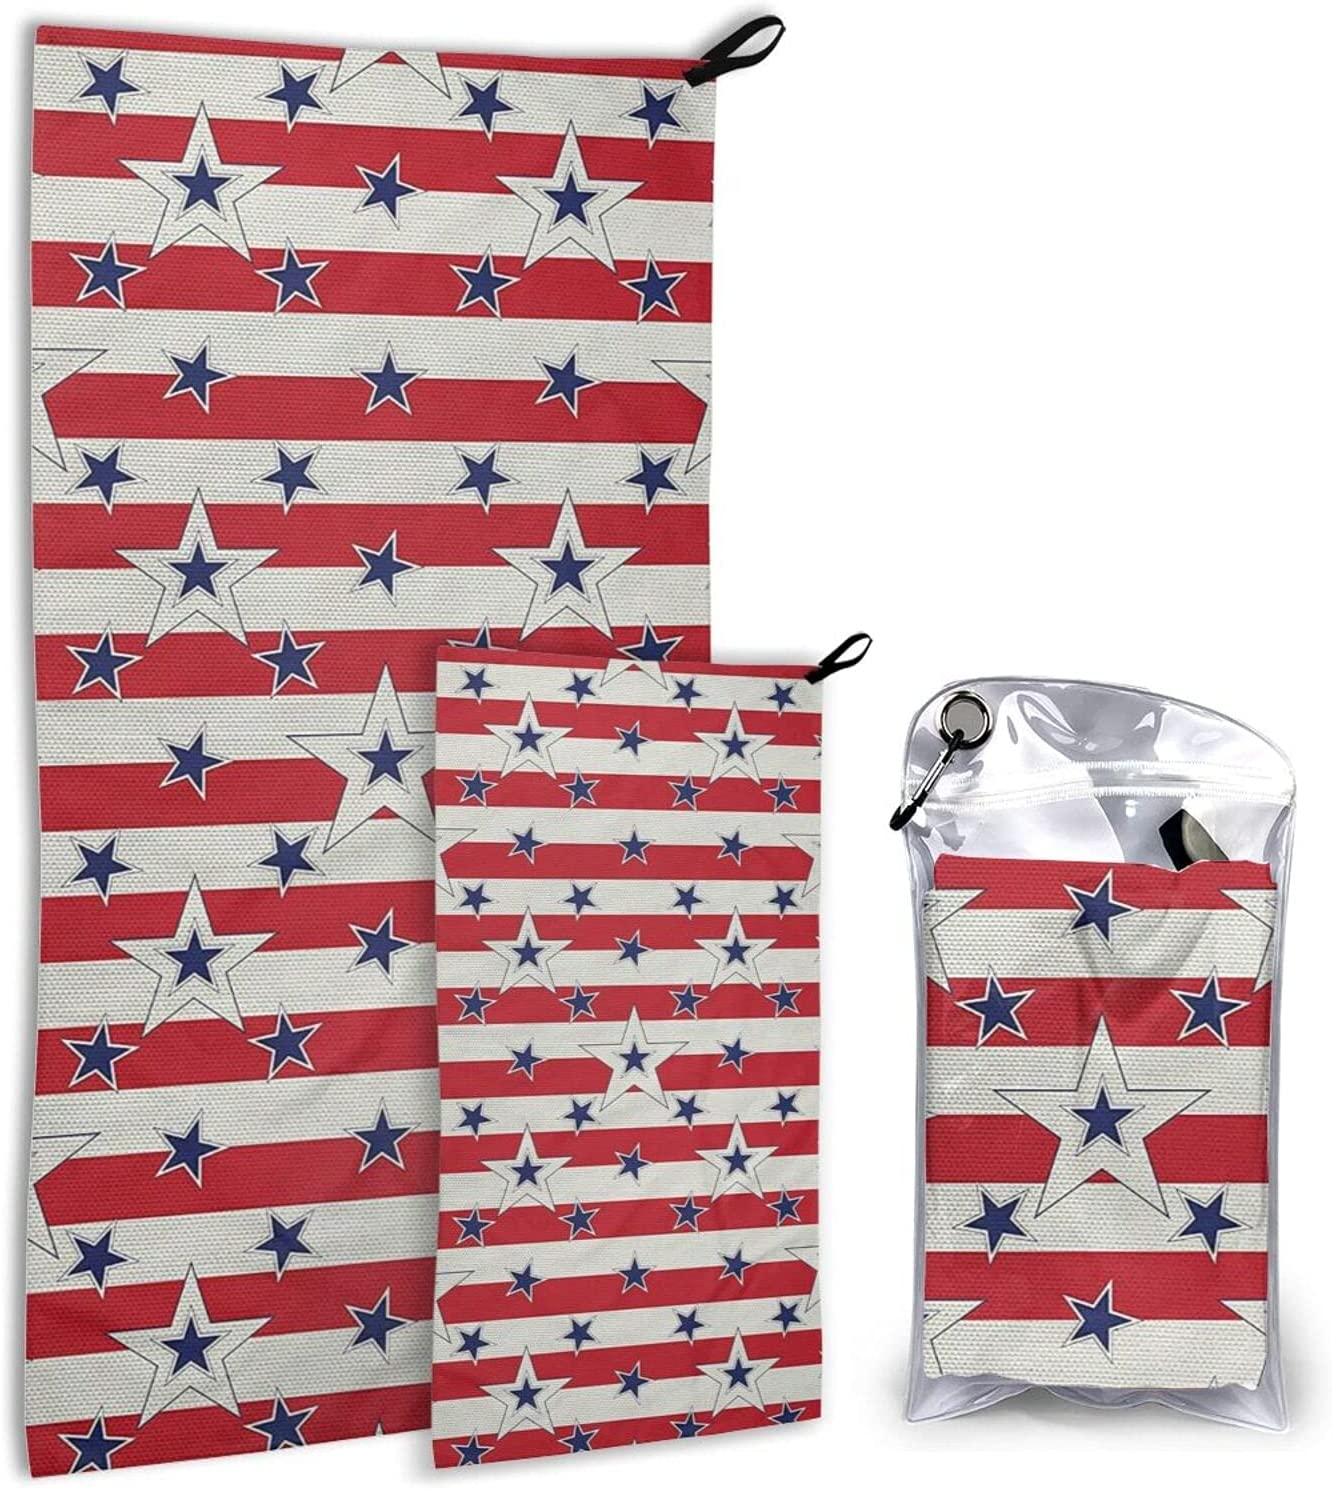 Patriotic Pattern Love Microfiber Towels 2 Pack Ca Quick low-pricing Ranking TOP19 Dry -